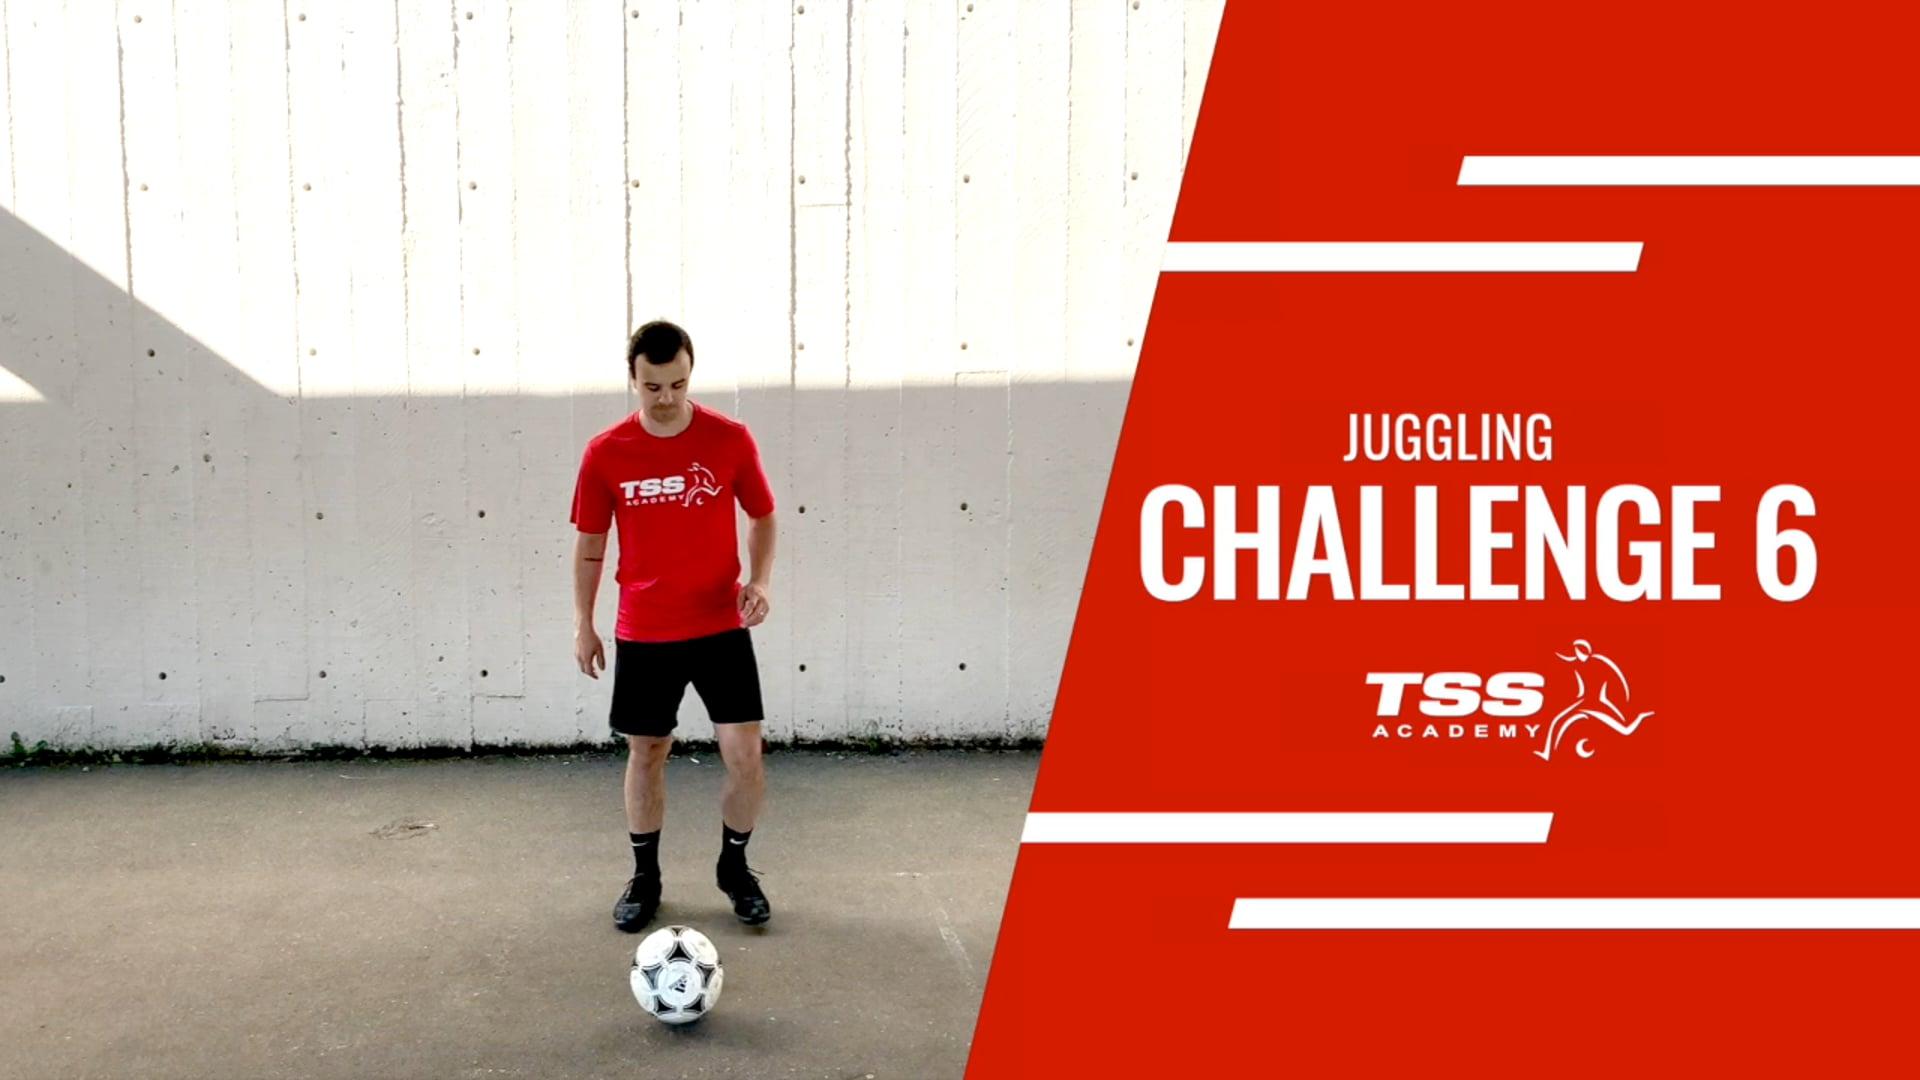 TSS Juggling Challenge 6